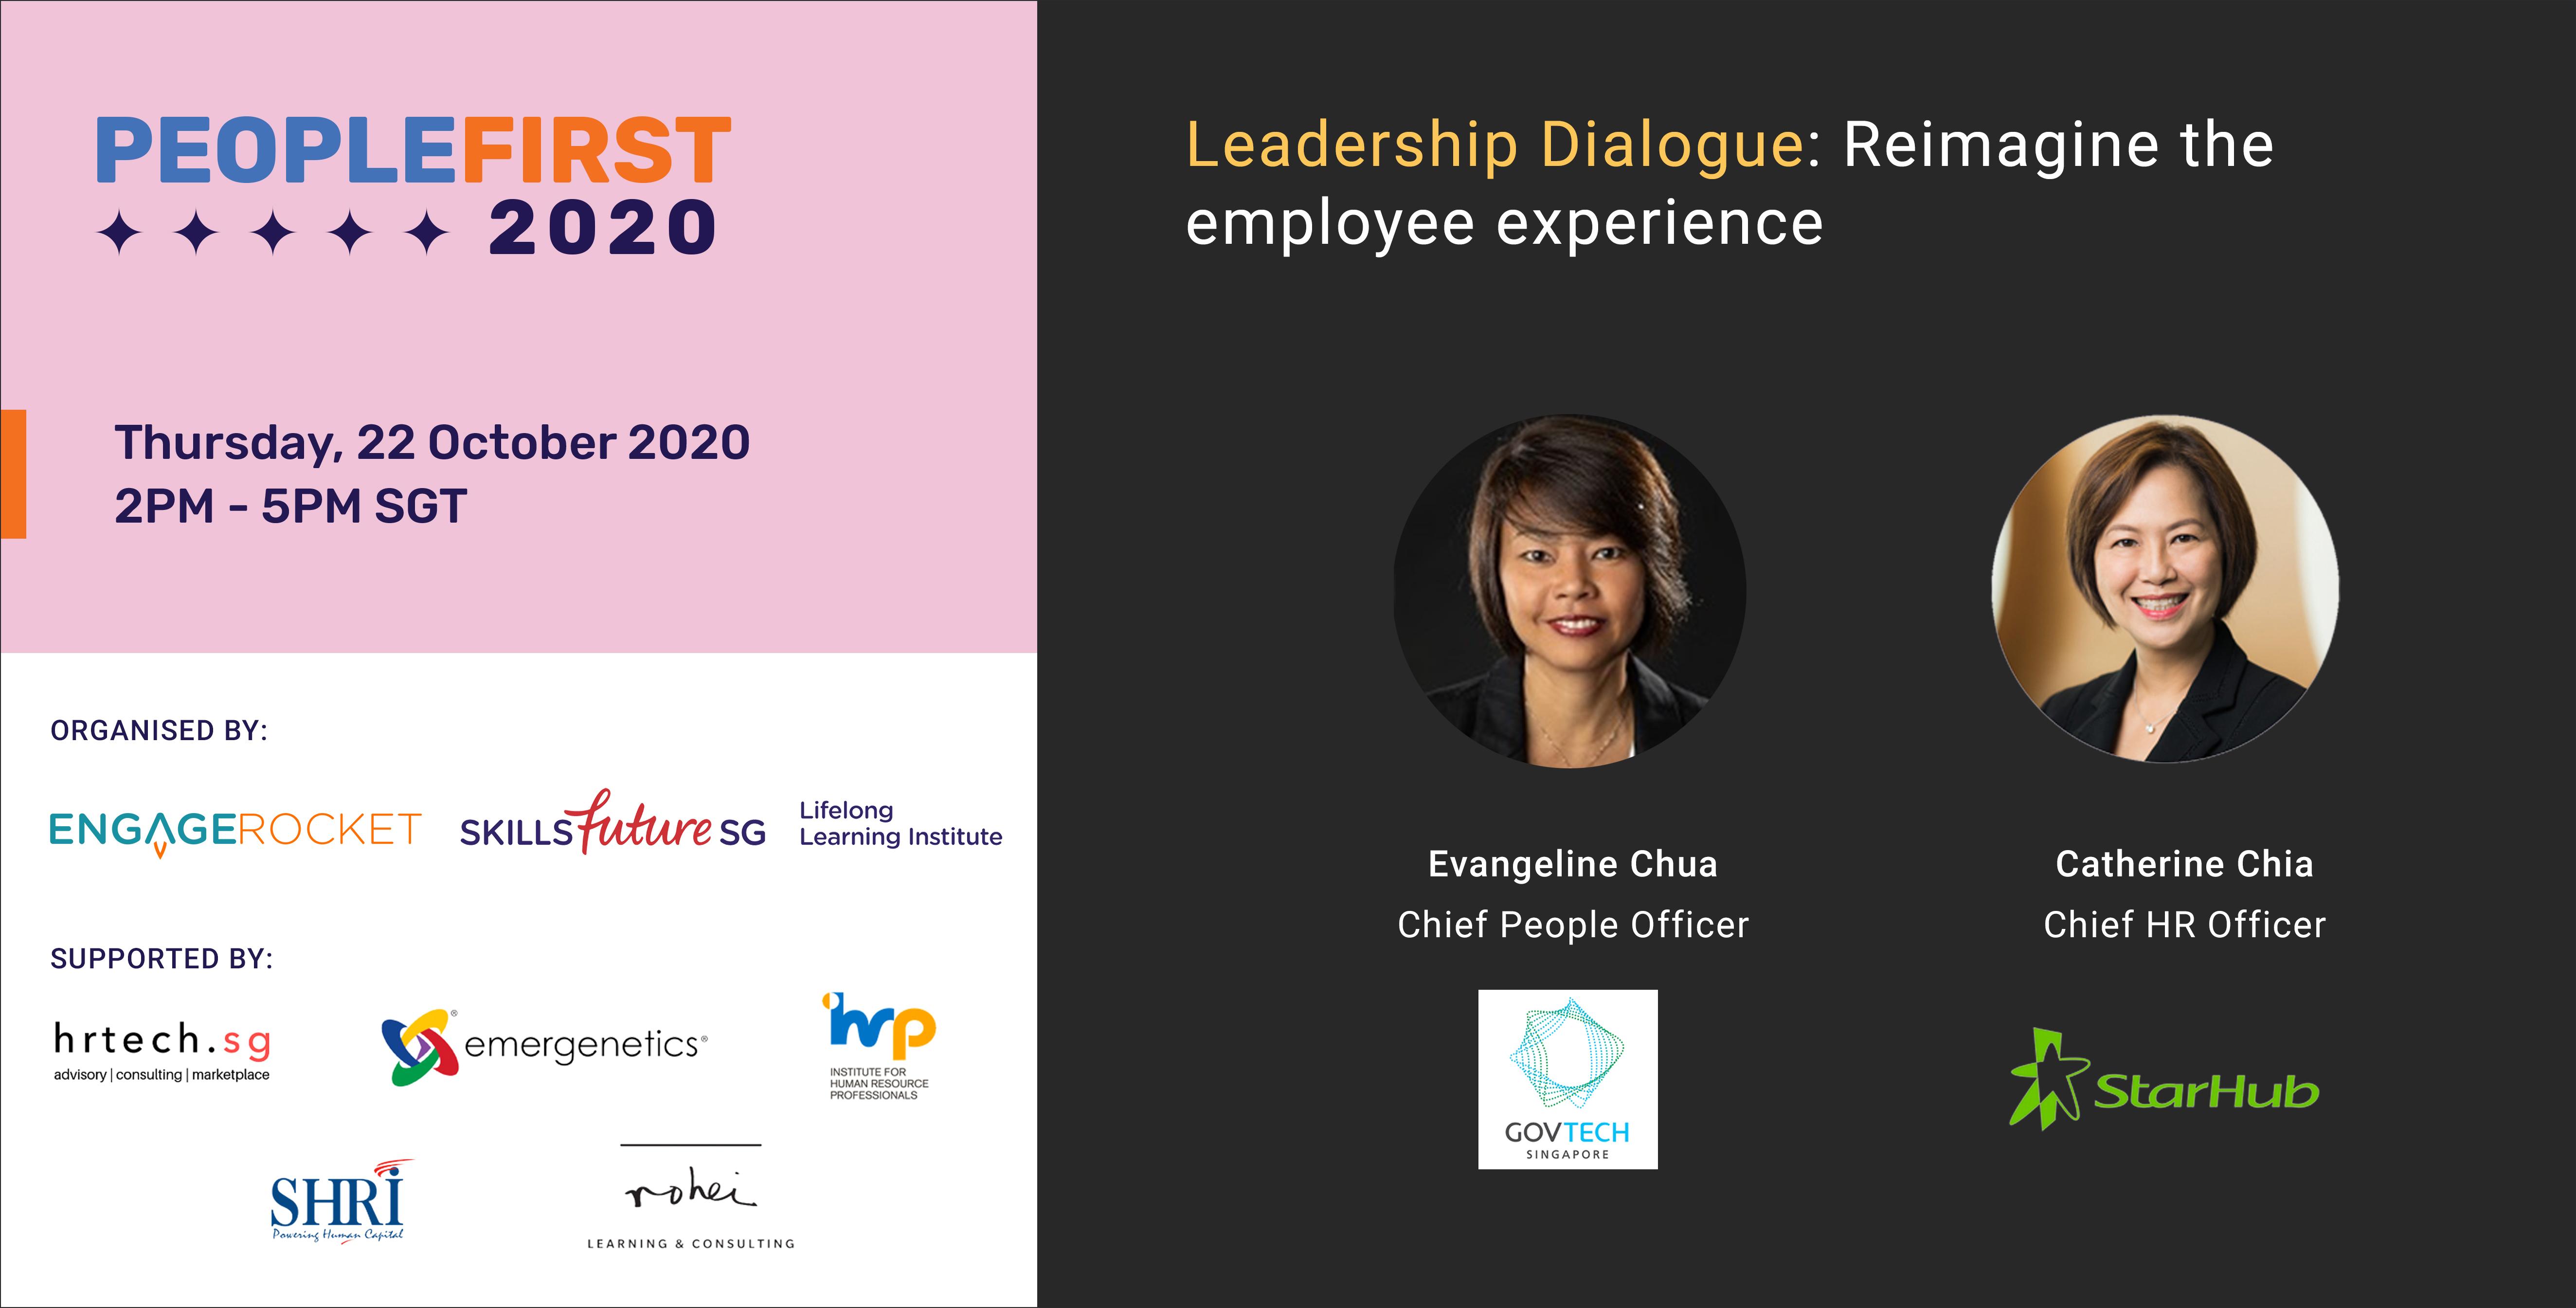 Leadership Dialogue - GovTech & Starhub